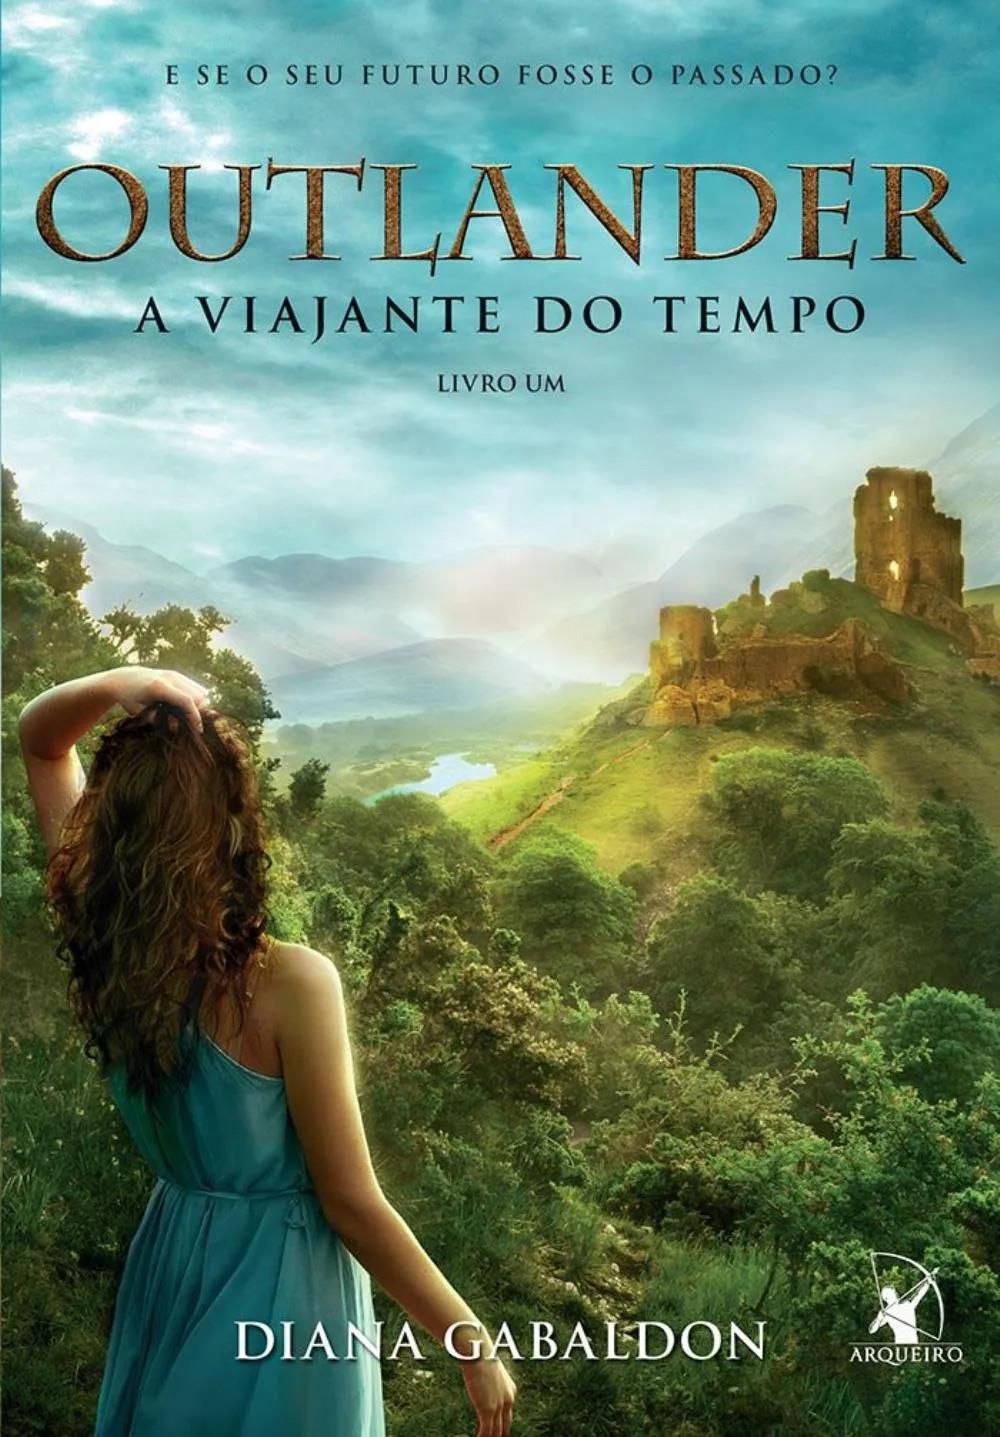 Outlander – A Viajante do Tempo de Diana Gabaldon